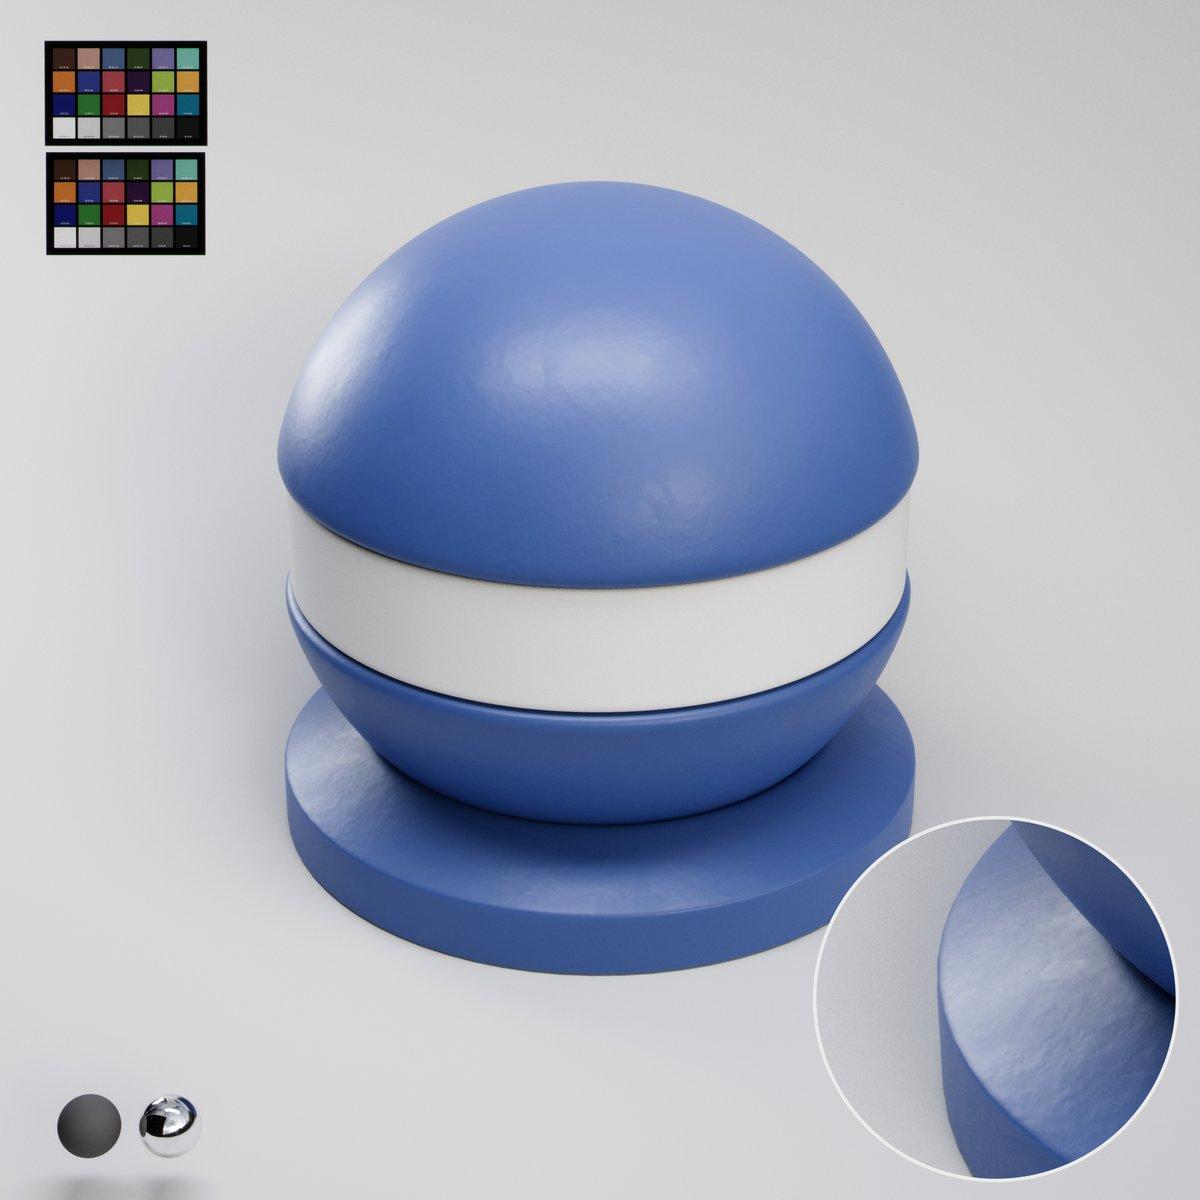 Day 309 More #Rubber  #3dartist #3darch #pbr #365materials #architecture #3dsMax #texture #process #digitalart #pbrmaterial #texturing #cgi #3D #d #rendering #autodesk #arnoldrender #substancedesigner